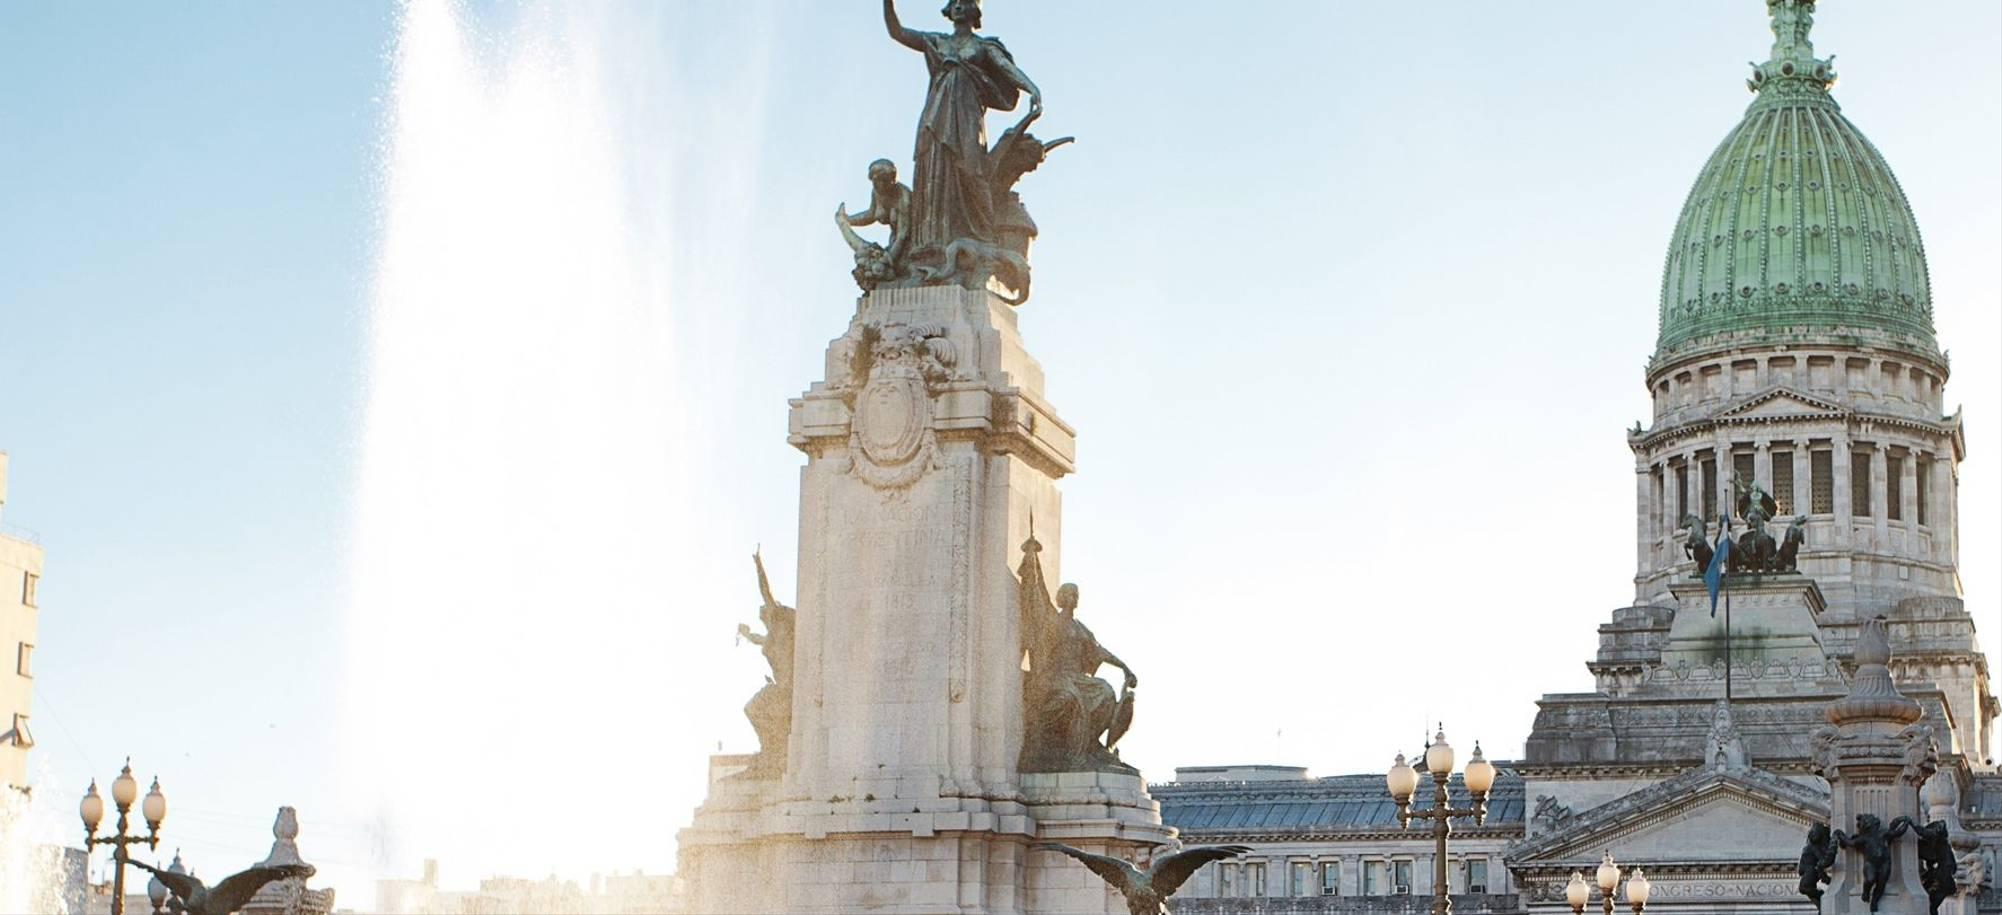 18 - Buenos Aires, National Congress building - Itinerary Desktop.jpg